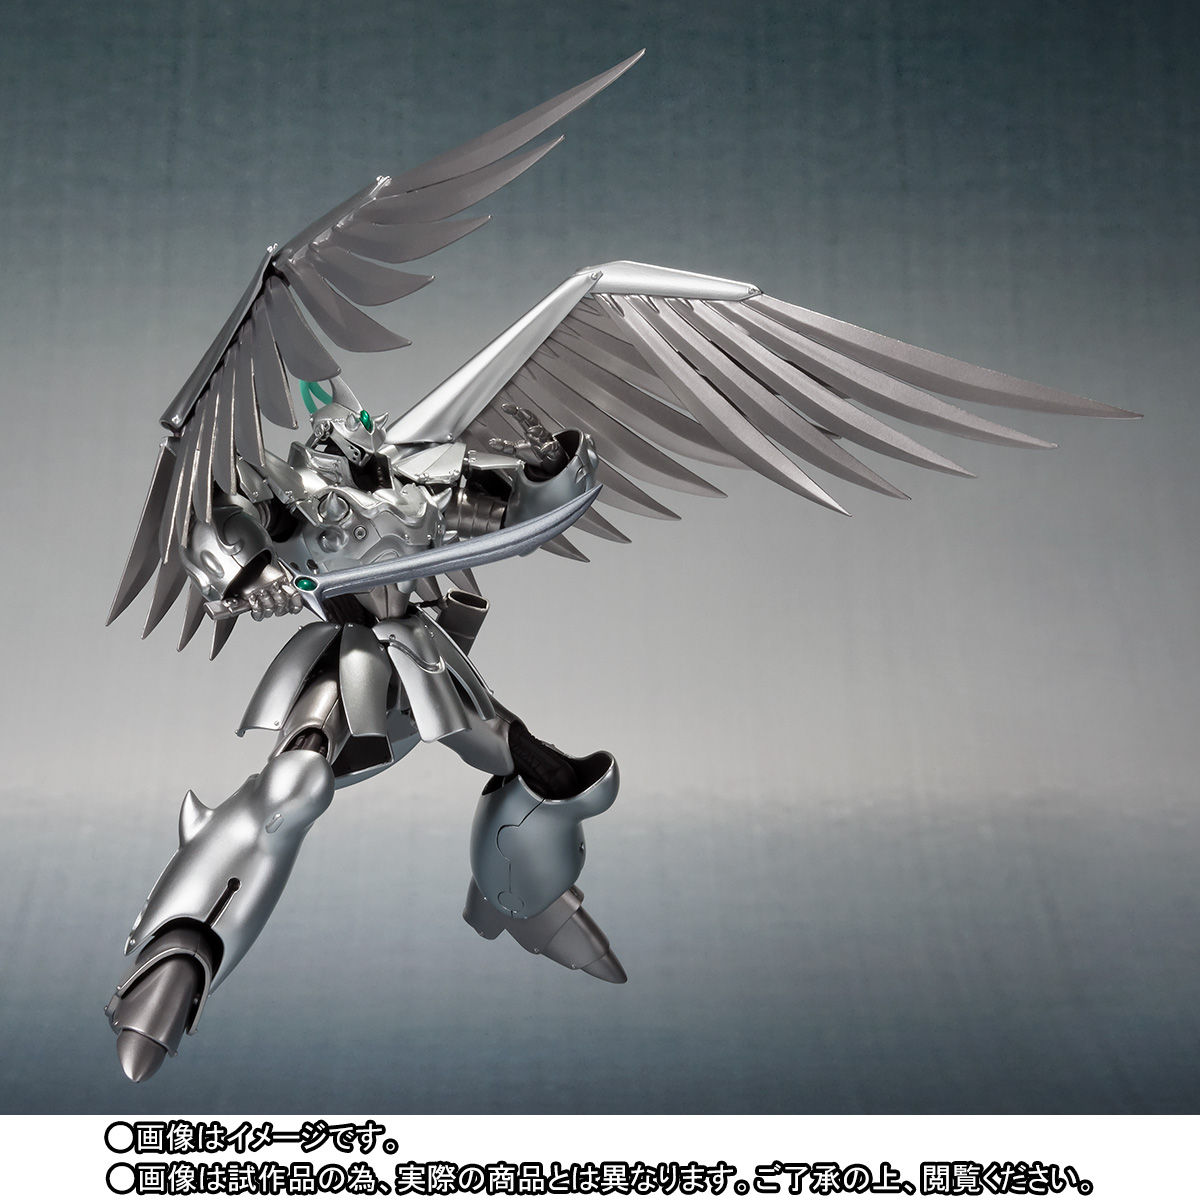 ROBOT魂〈SIDE PB〉『飛甲兵』機甲界ガリアン 鉄の紋章 可動フィギュア-008